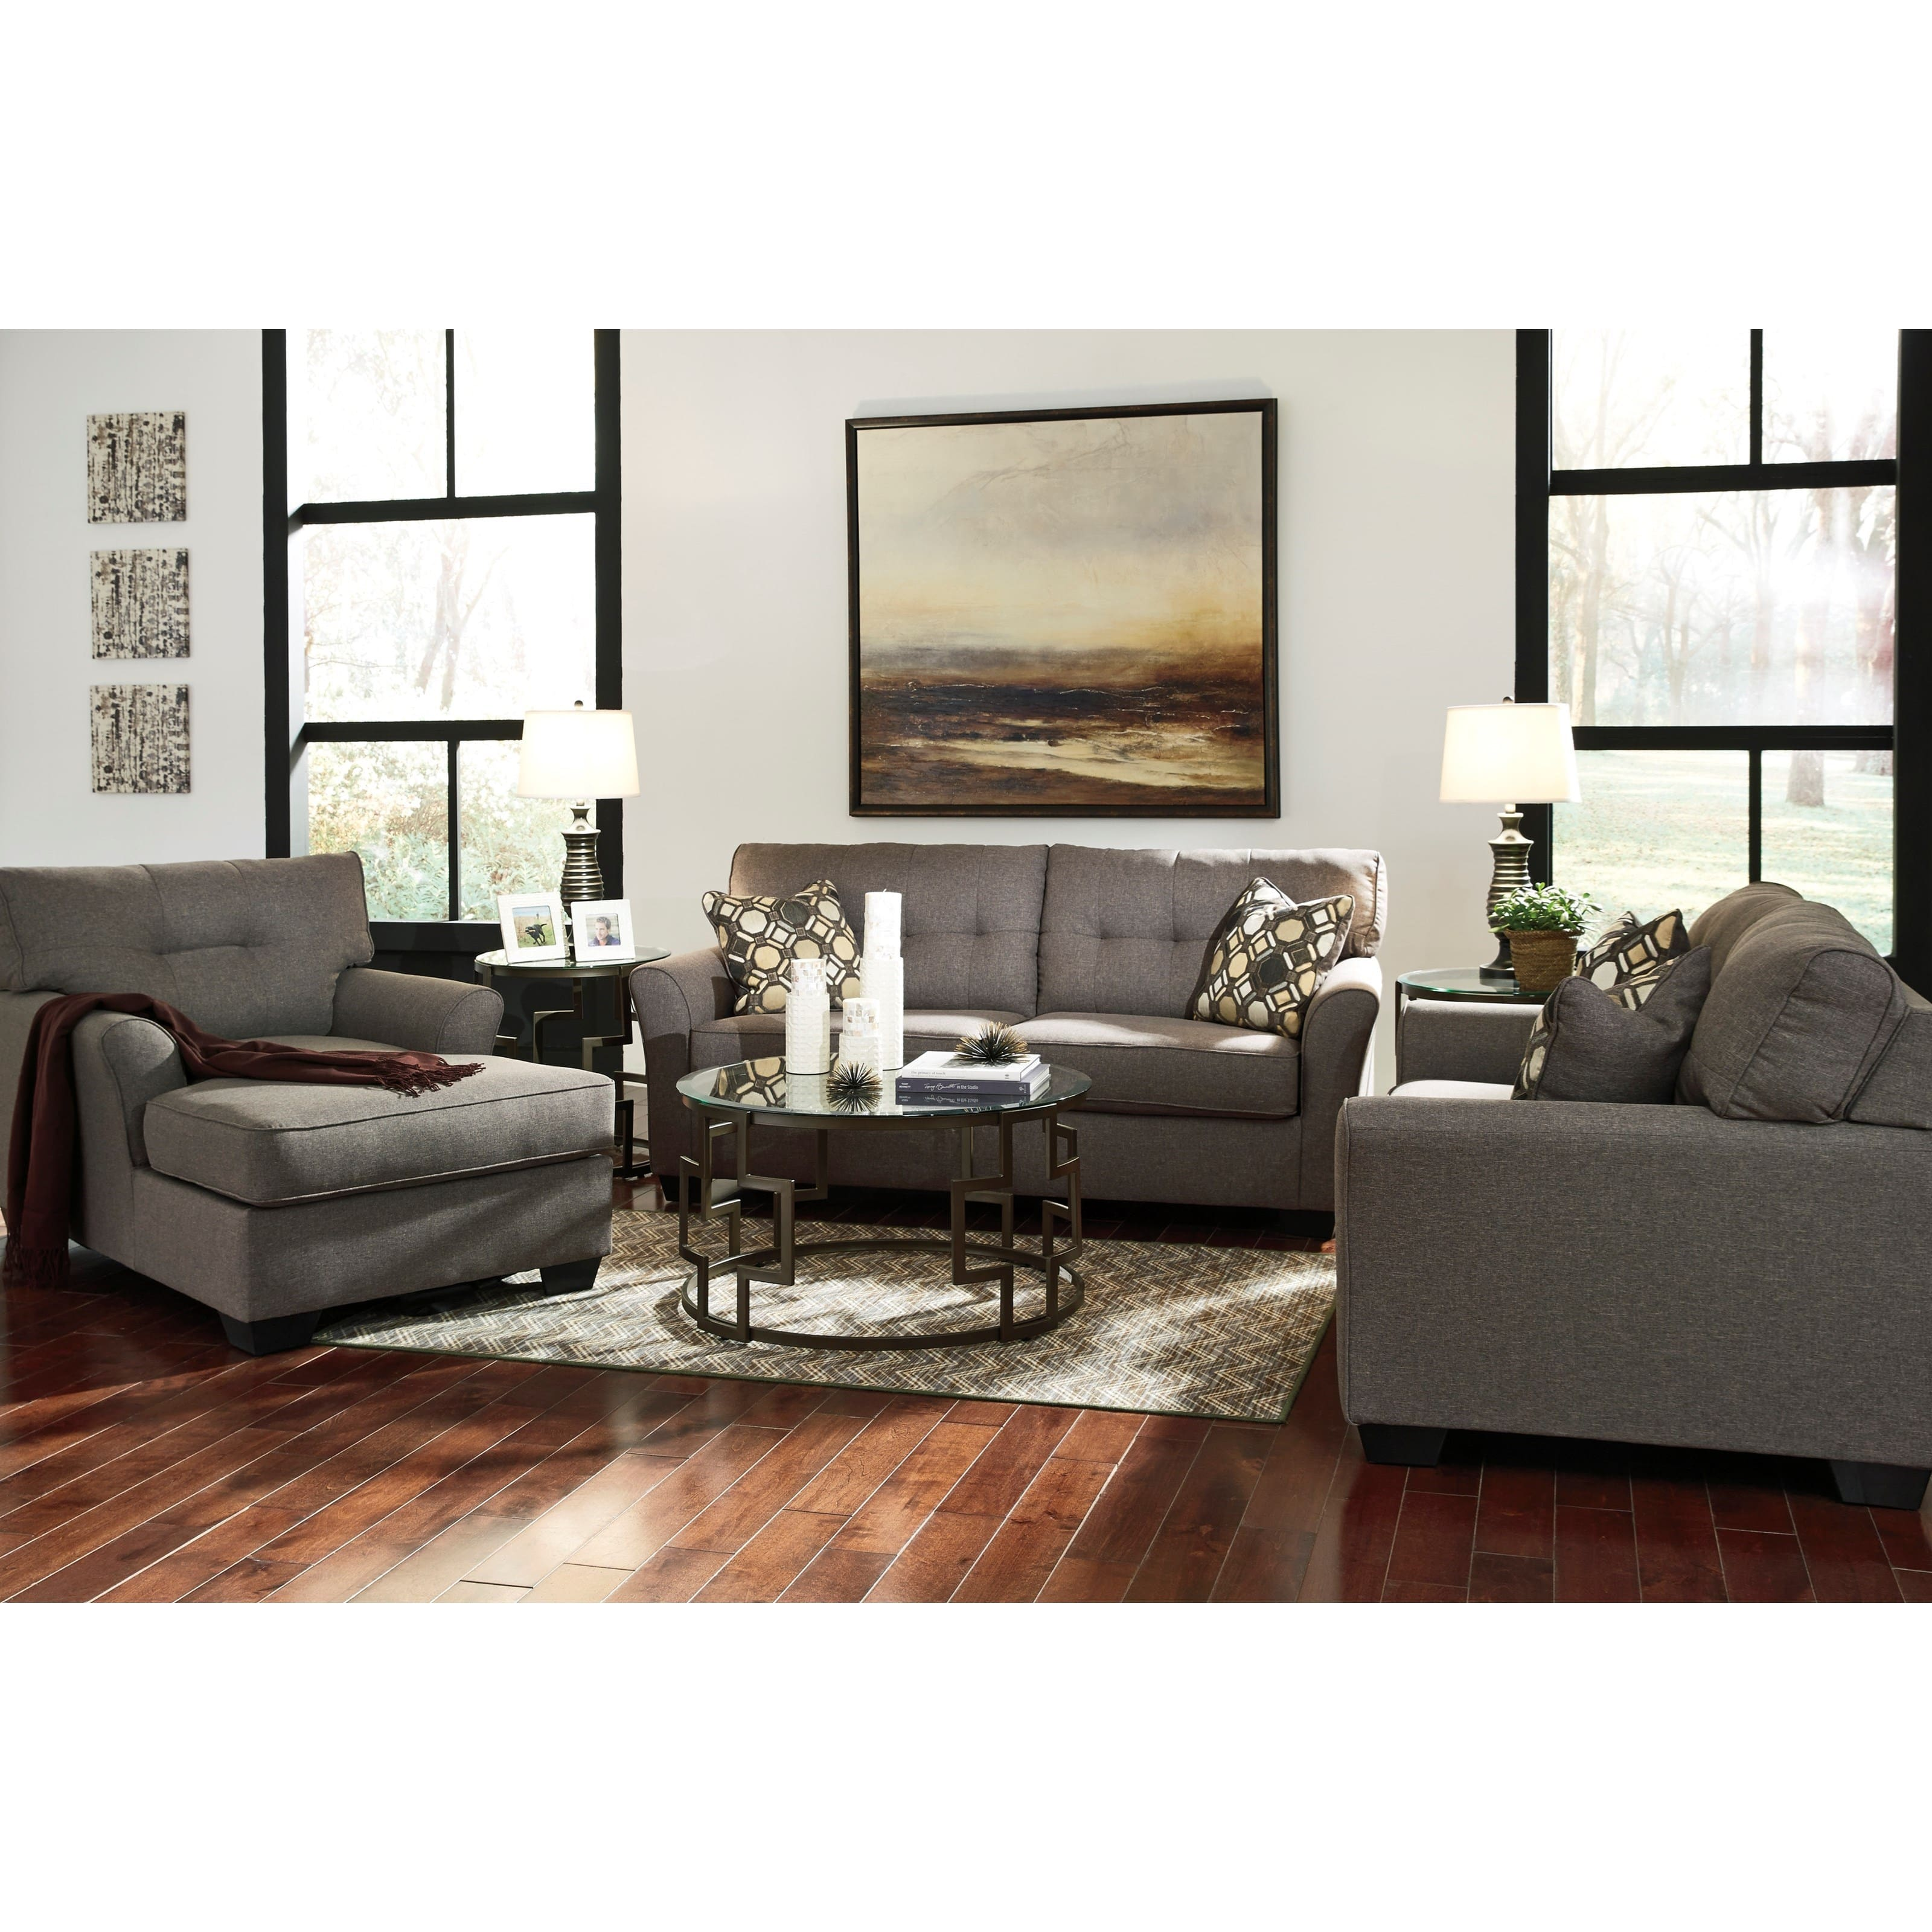 Magnificent Ashley Homestore Tibbee 5 Piece Living Room Set 748 Darcy Dailytribune Chair Design For Home Dailytribuneorg